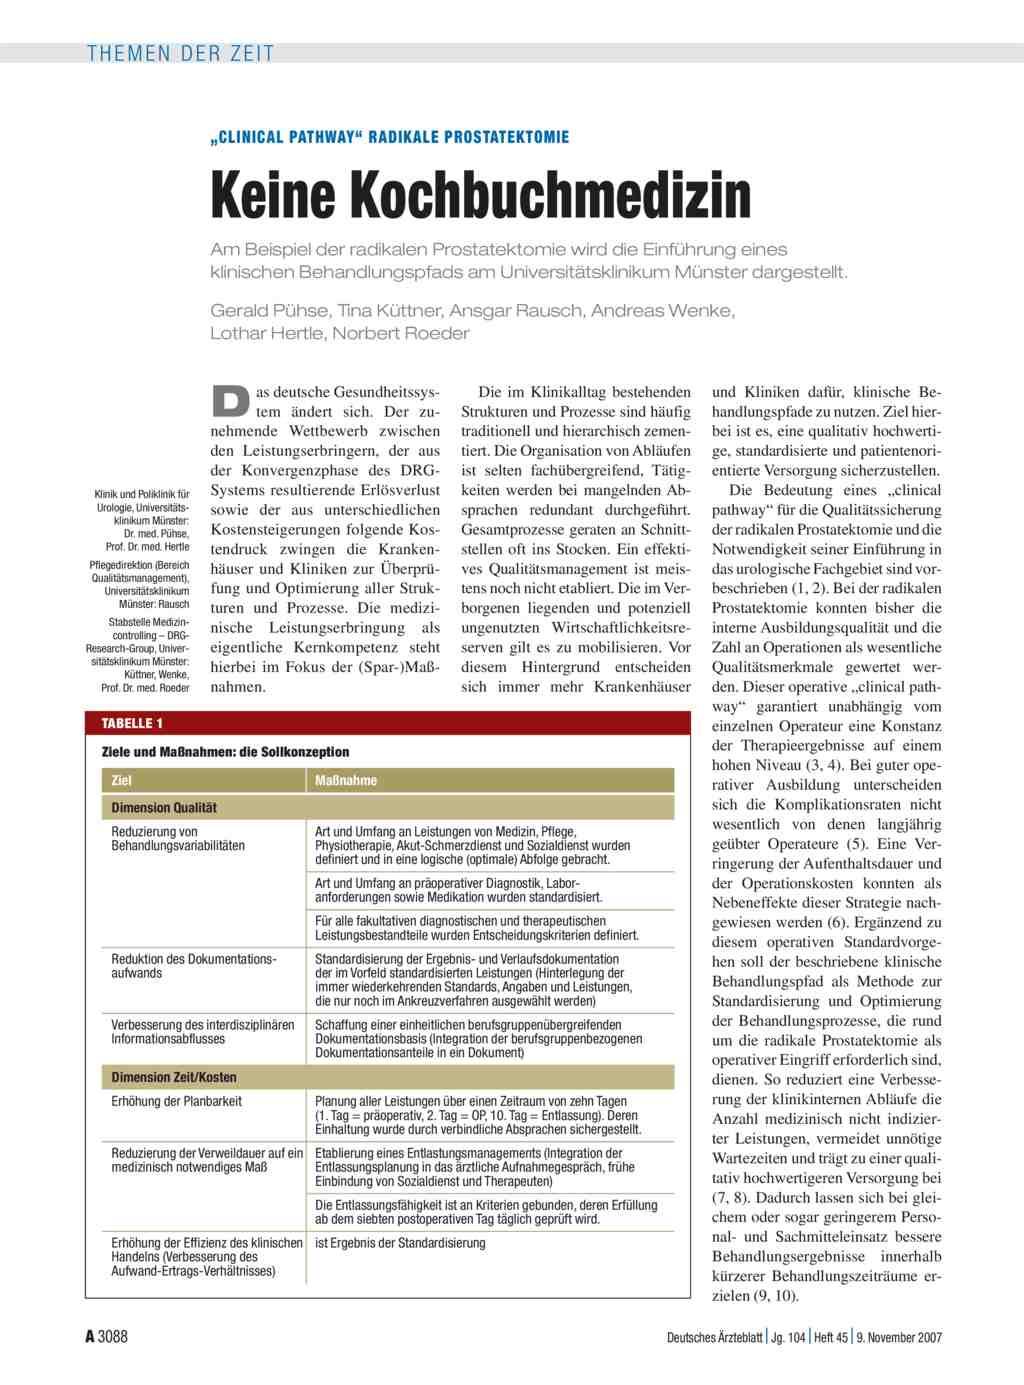 dissertation radikale prostatektomie